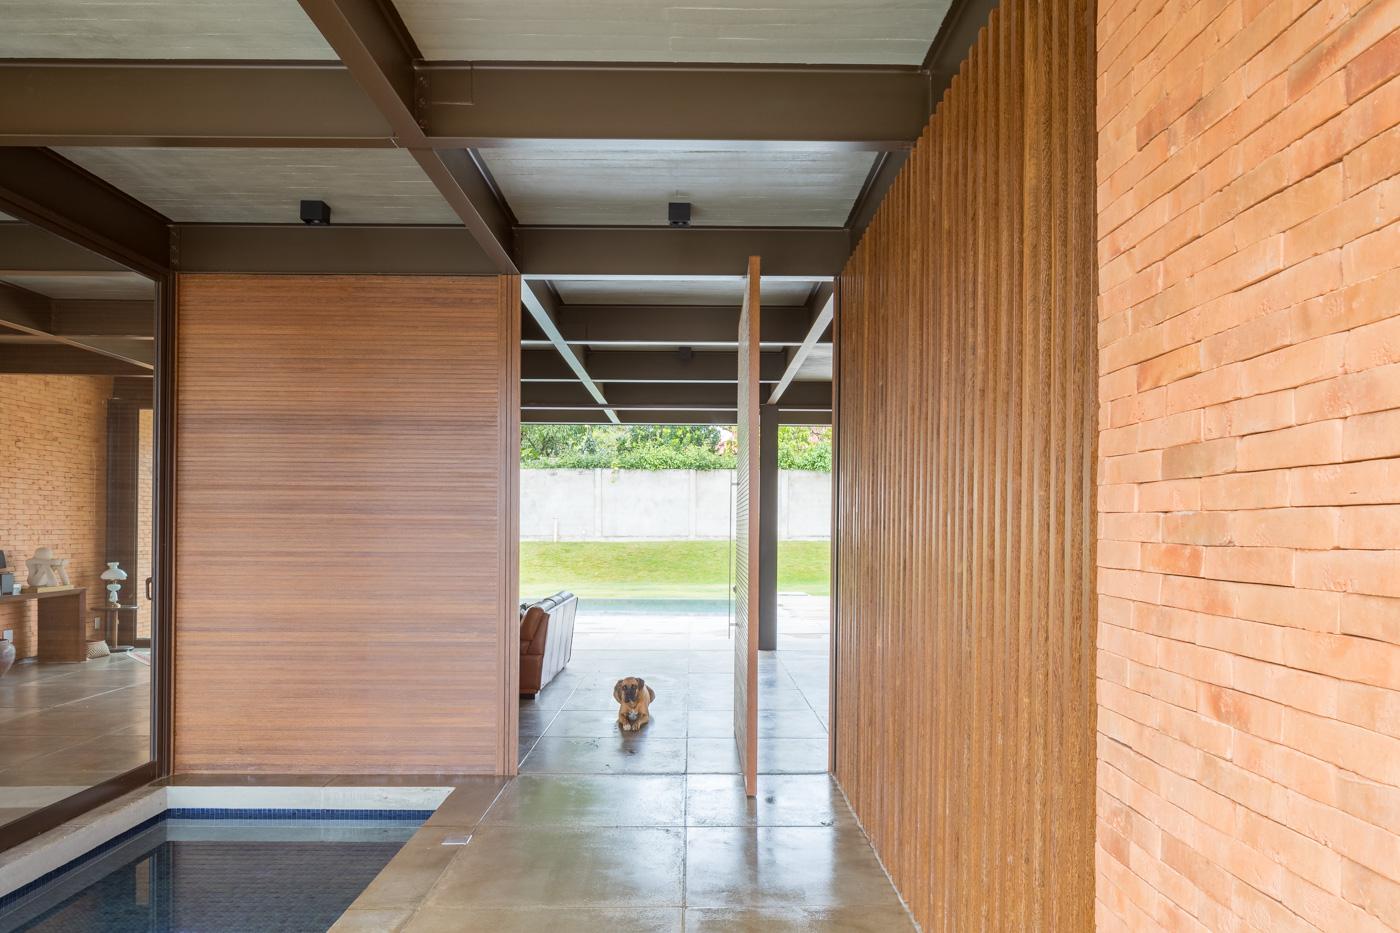 Estúdio-Mova-arquitetura-interiores-comercial-foto-haruo-mikami_146-HDR_Baixa.jpg